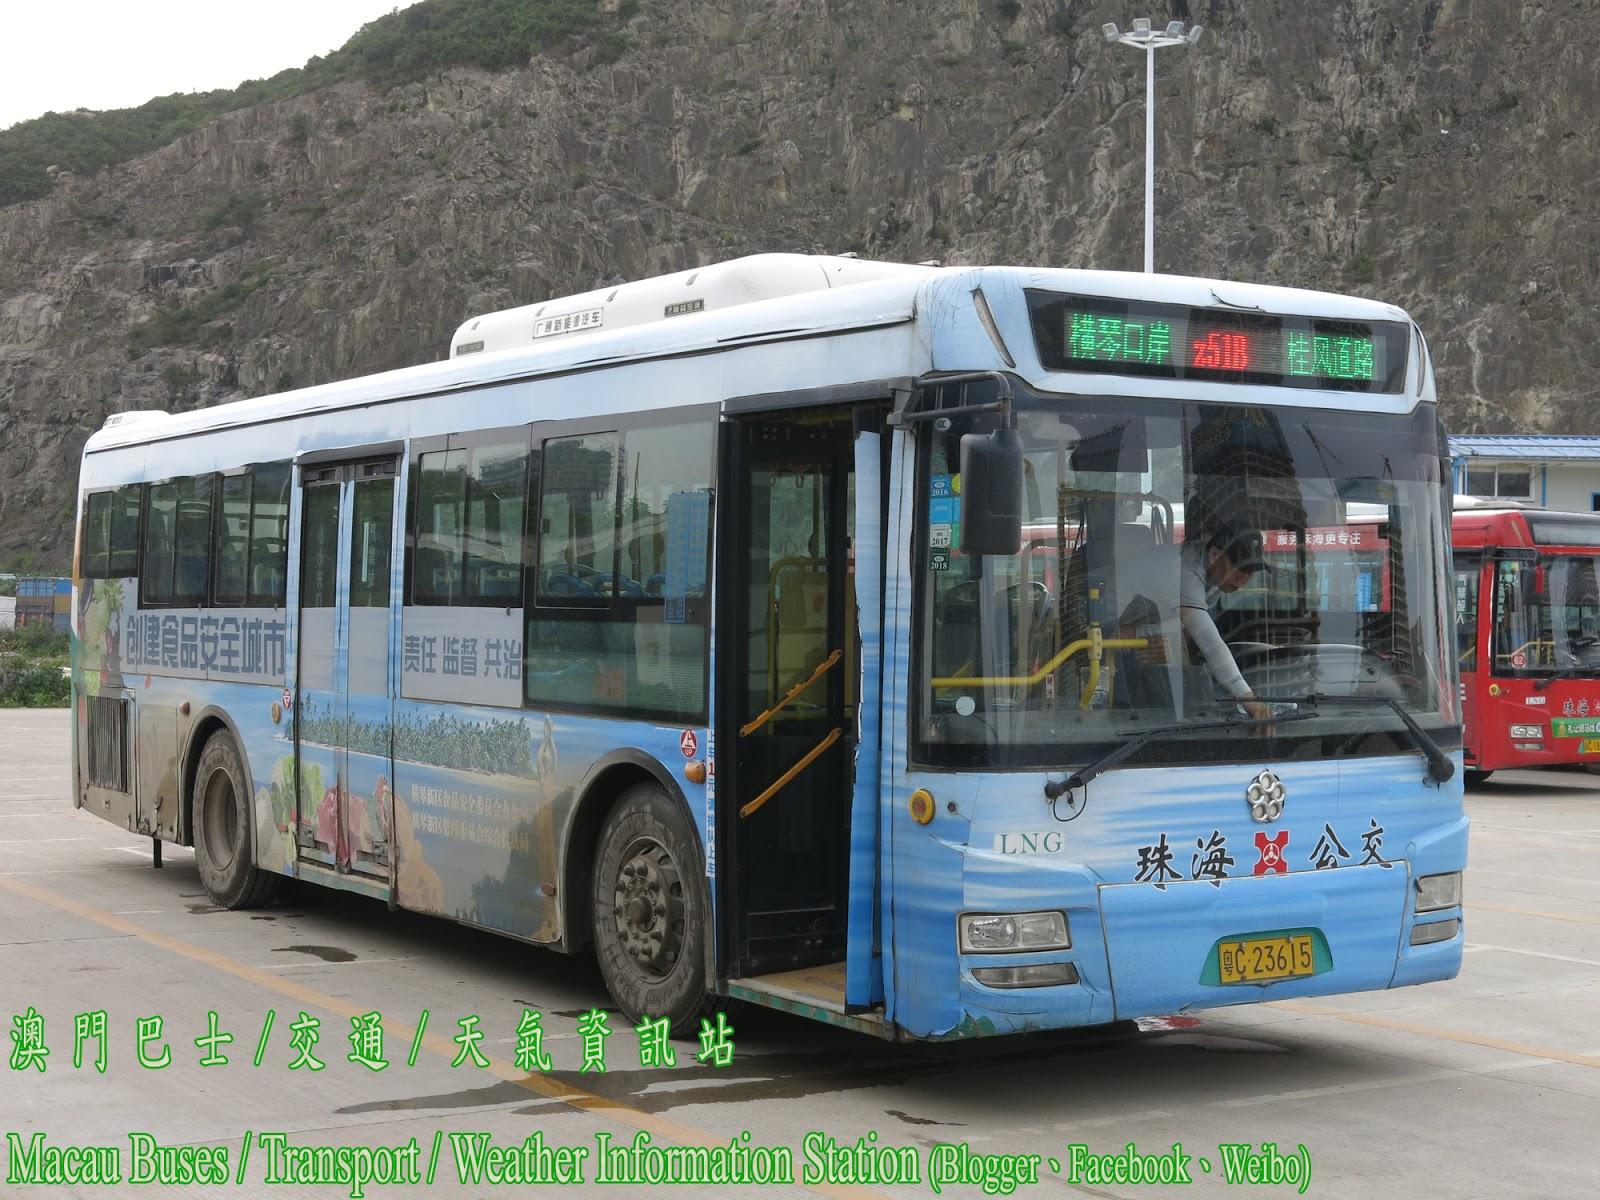 澳 門 巴 士 / 交 通 / 天 氣 資 訊 站 Macau Buses / Transport / Weather Information Station: 珠海公交將Z51路線臨時分拆Z51A ...